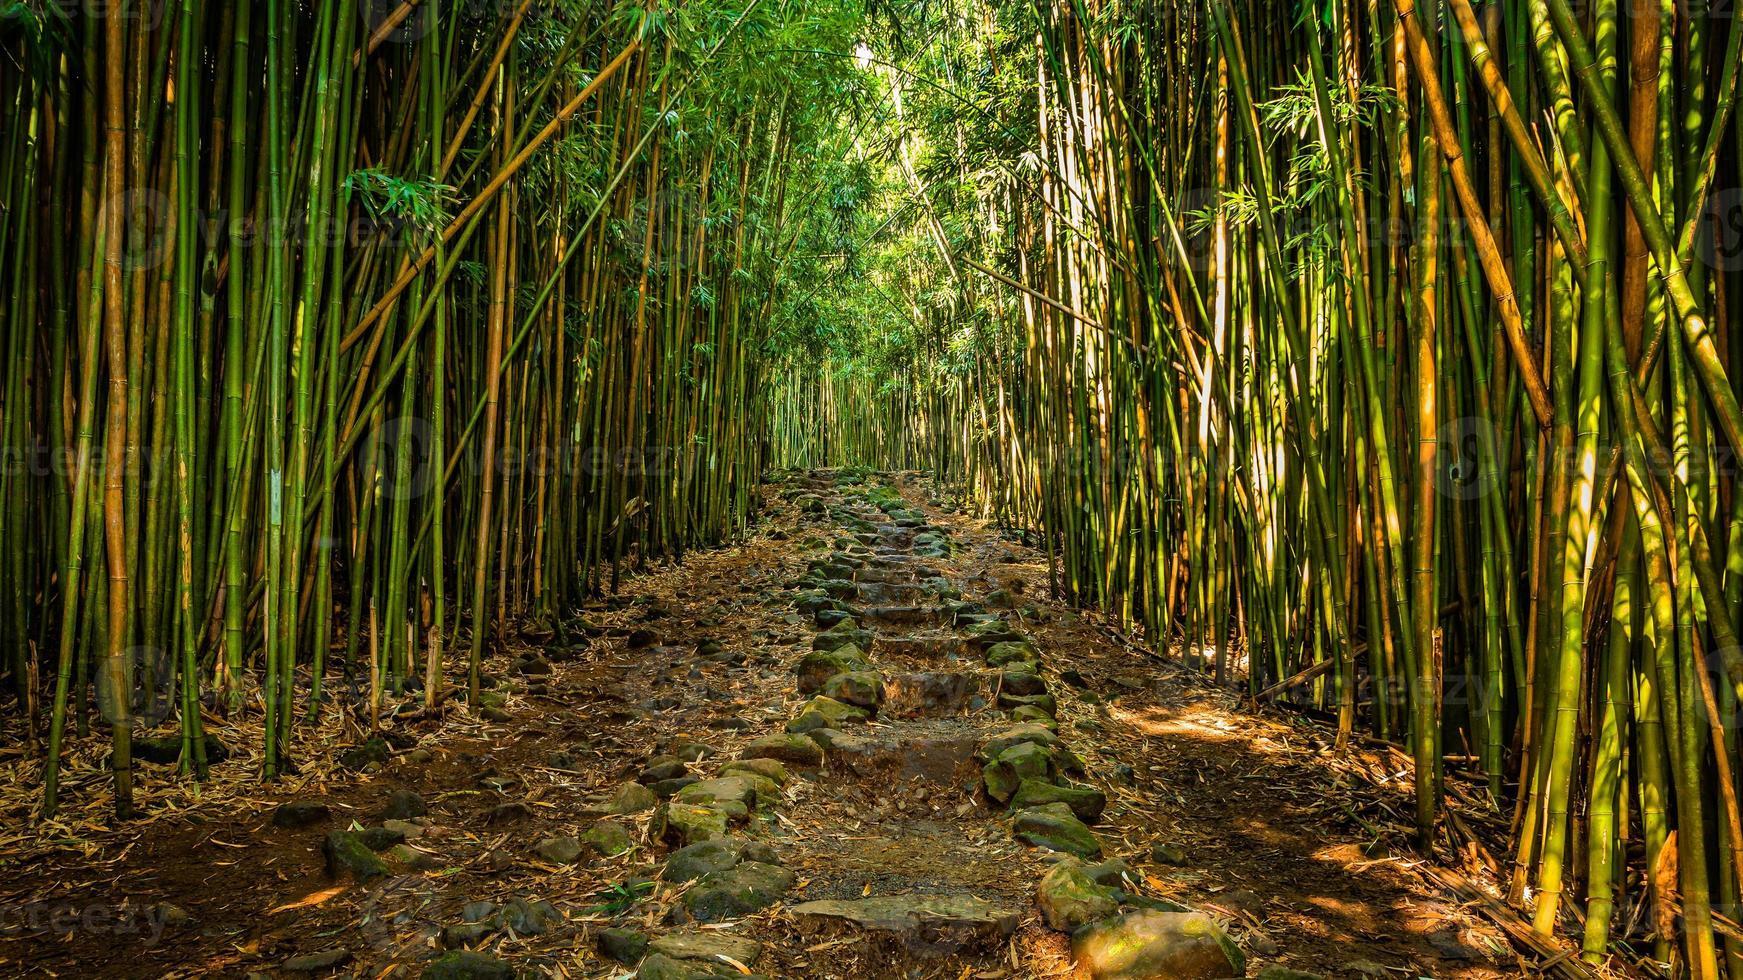 camino a través del bosque de bambú foto